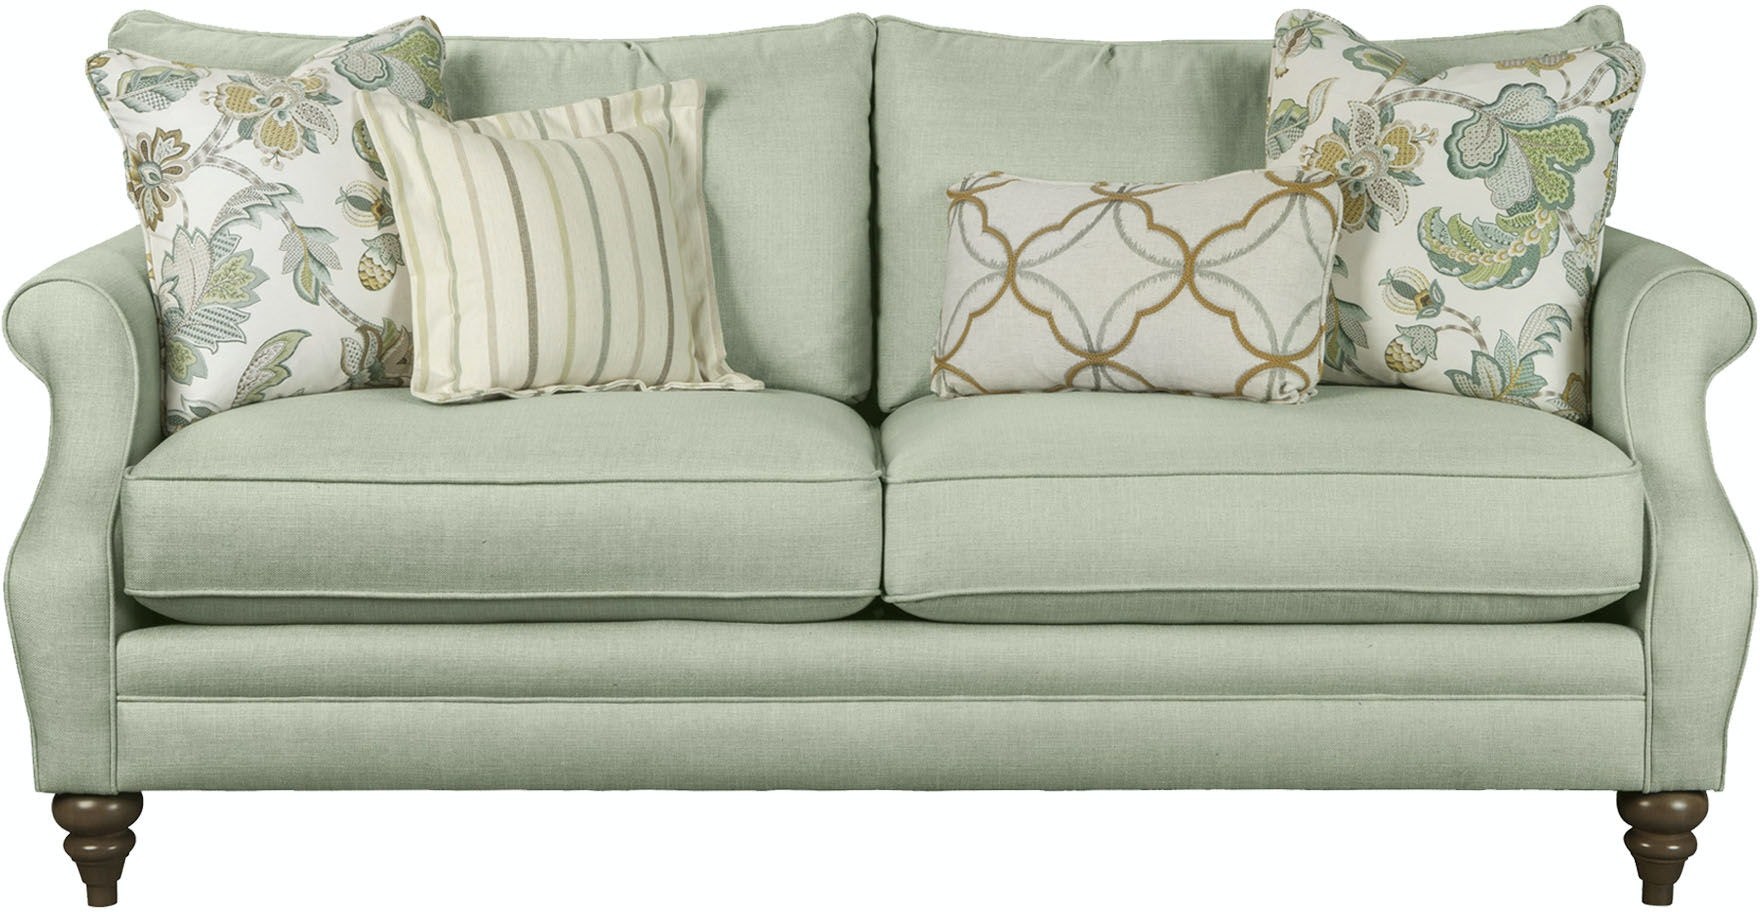 Paula Deen By Craftmaster Living Room Sofa P775650bd